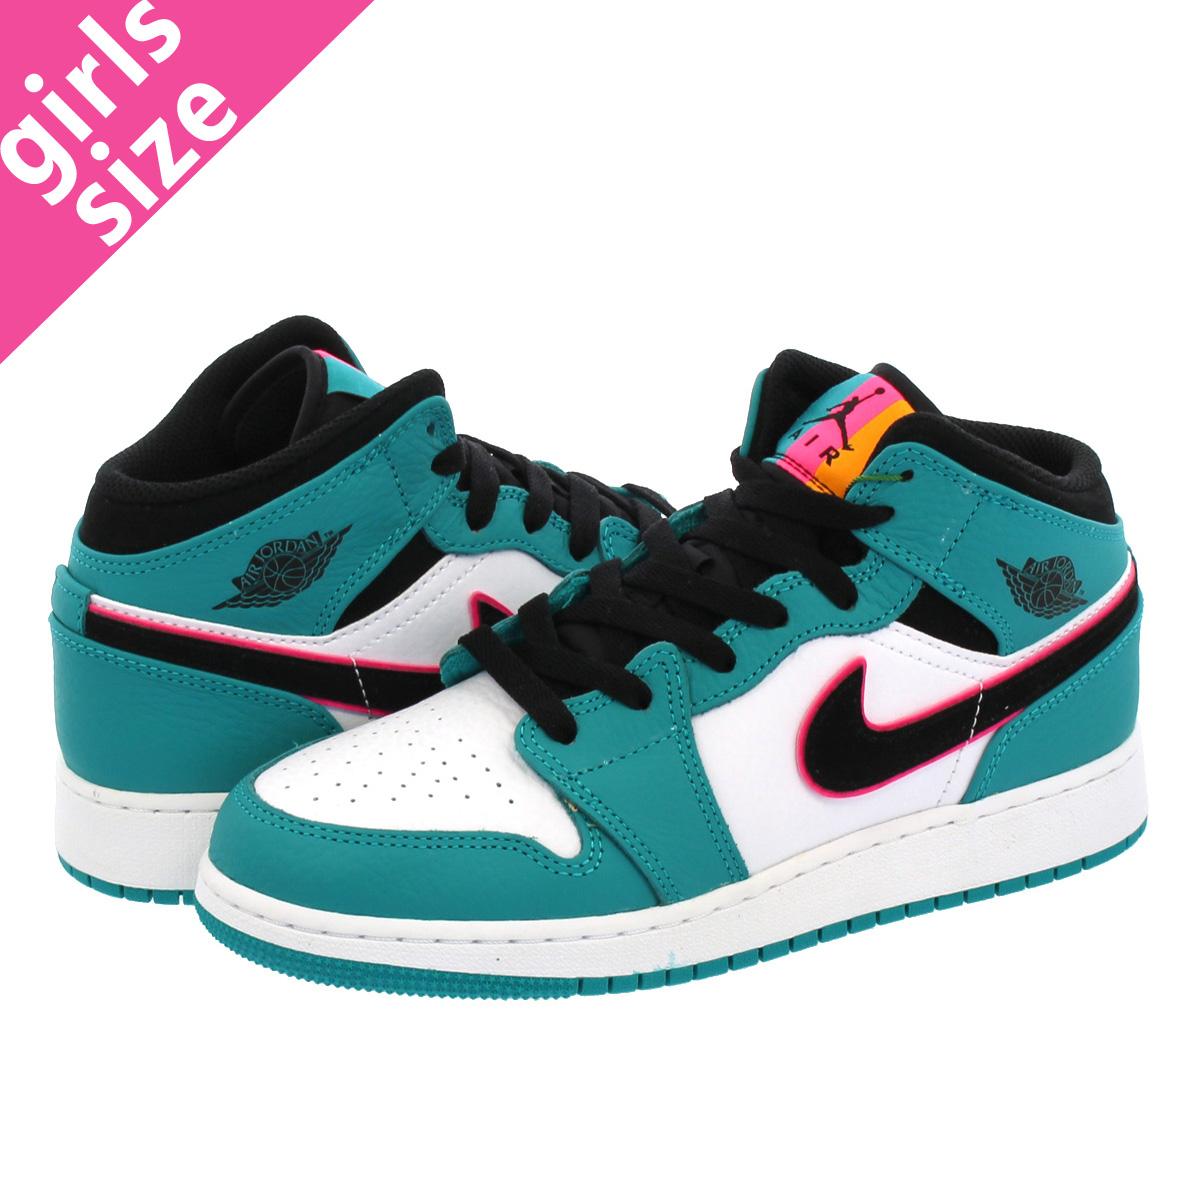 c453f711852 SELECT SHOP LOWTEX  NIKE AIR JORDAN 1 MID BG Nike Air Jordan 1 mid BG TURBO  GREEN BLACK HYPER PINK ORANGE PEEL bq6931-306